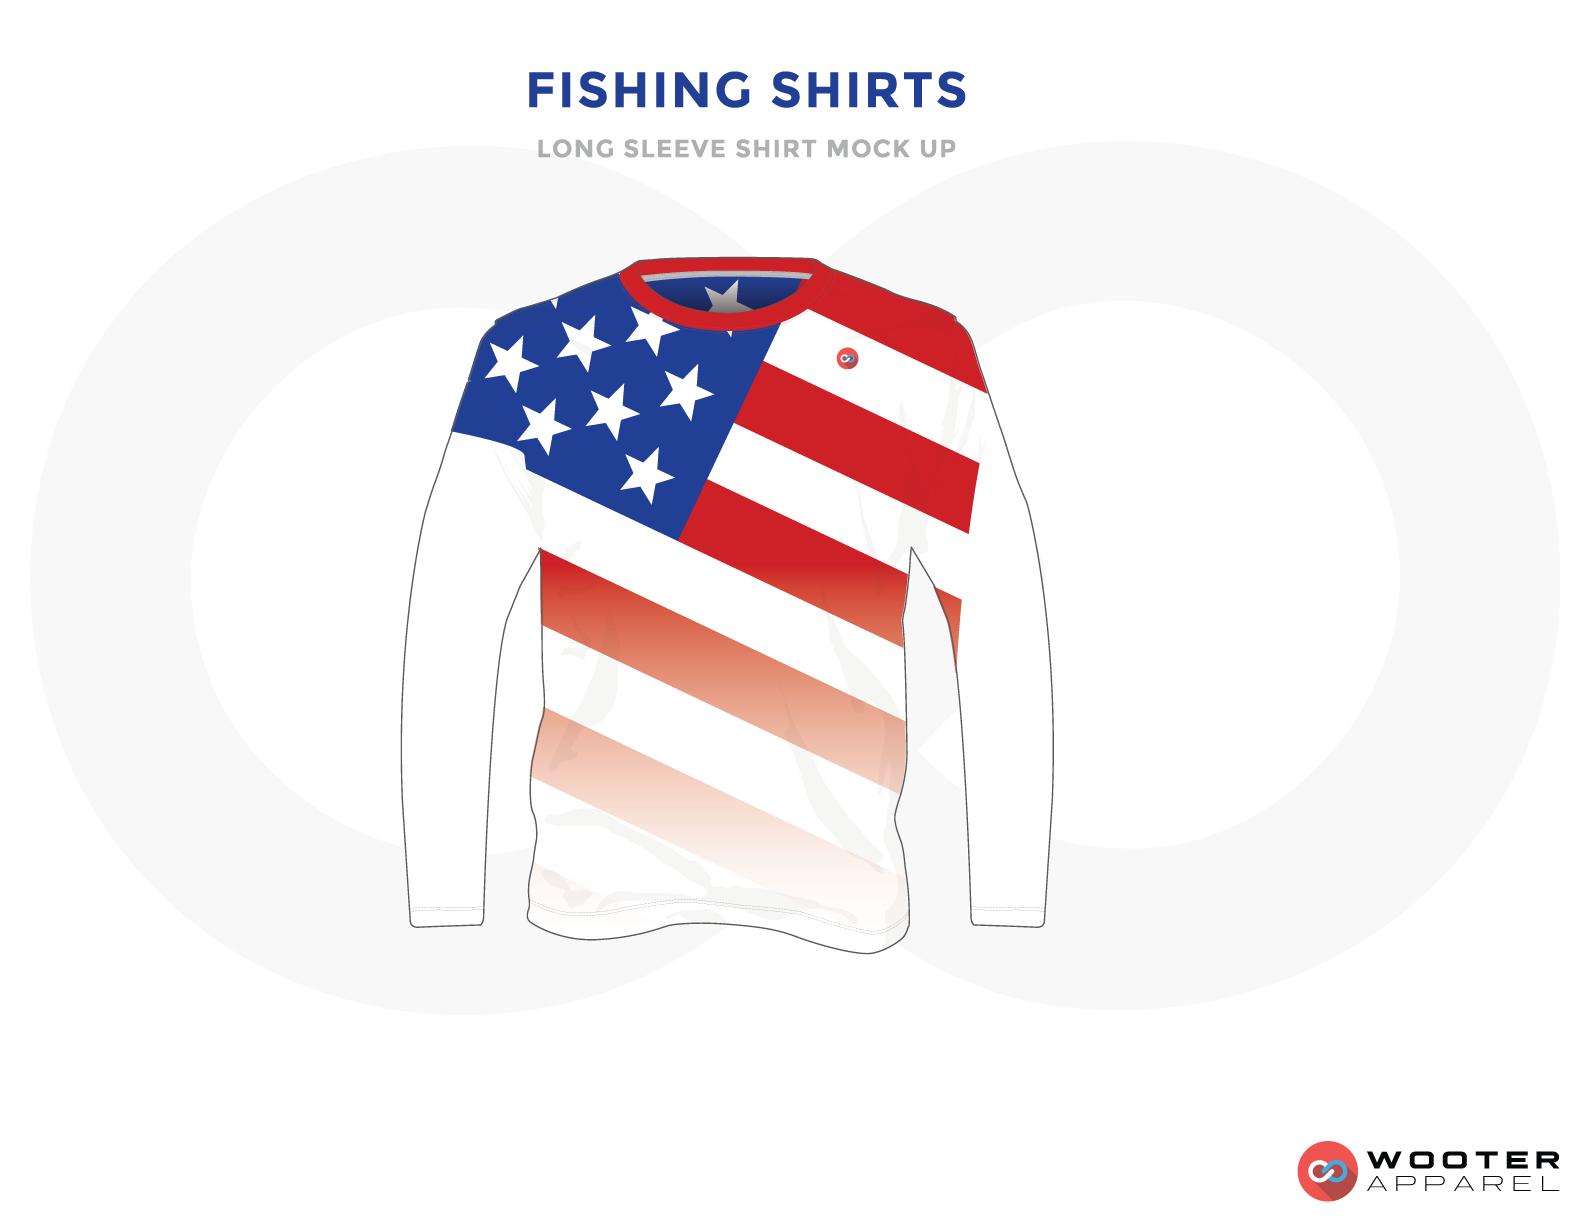 FISHING SHIRTS, Blue, White and Red Premium Shooting Shirt